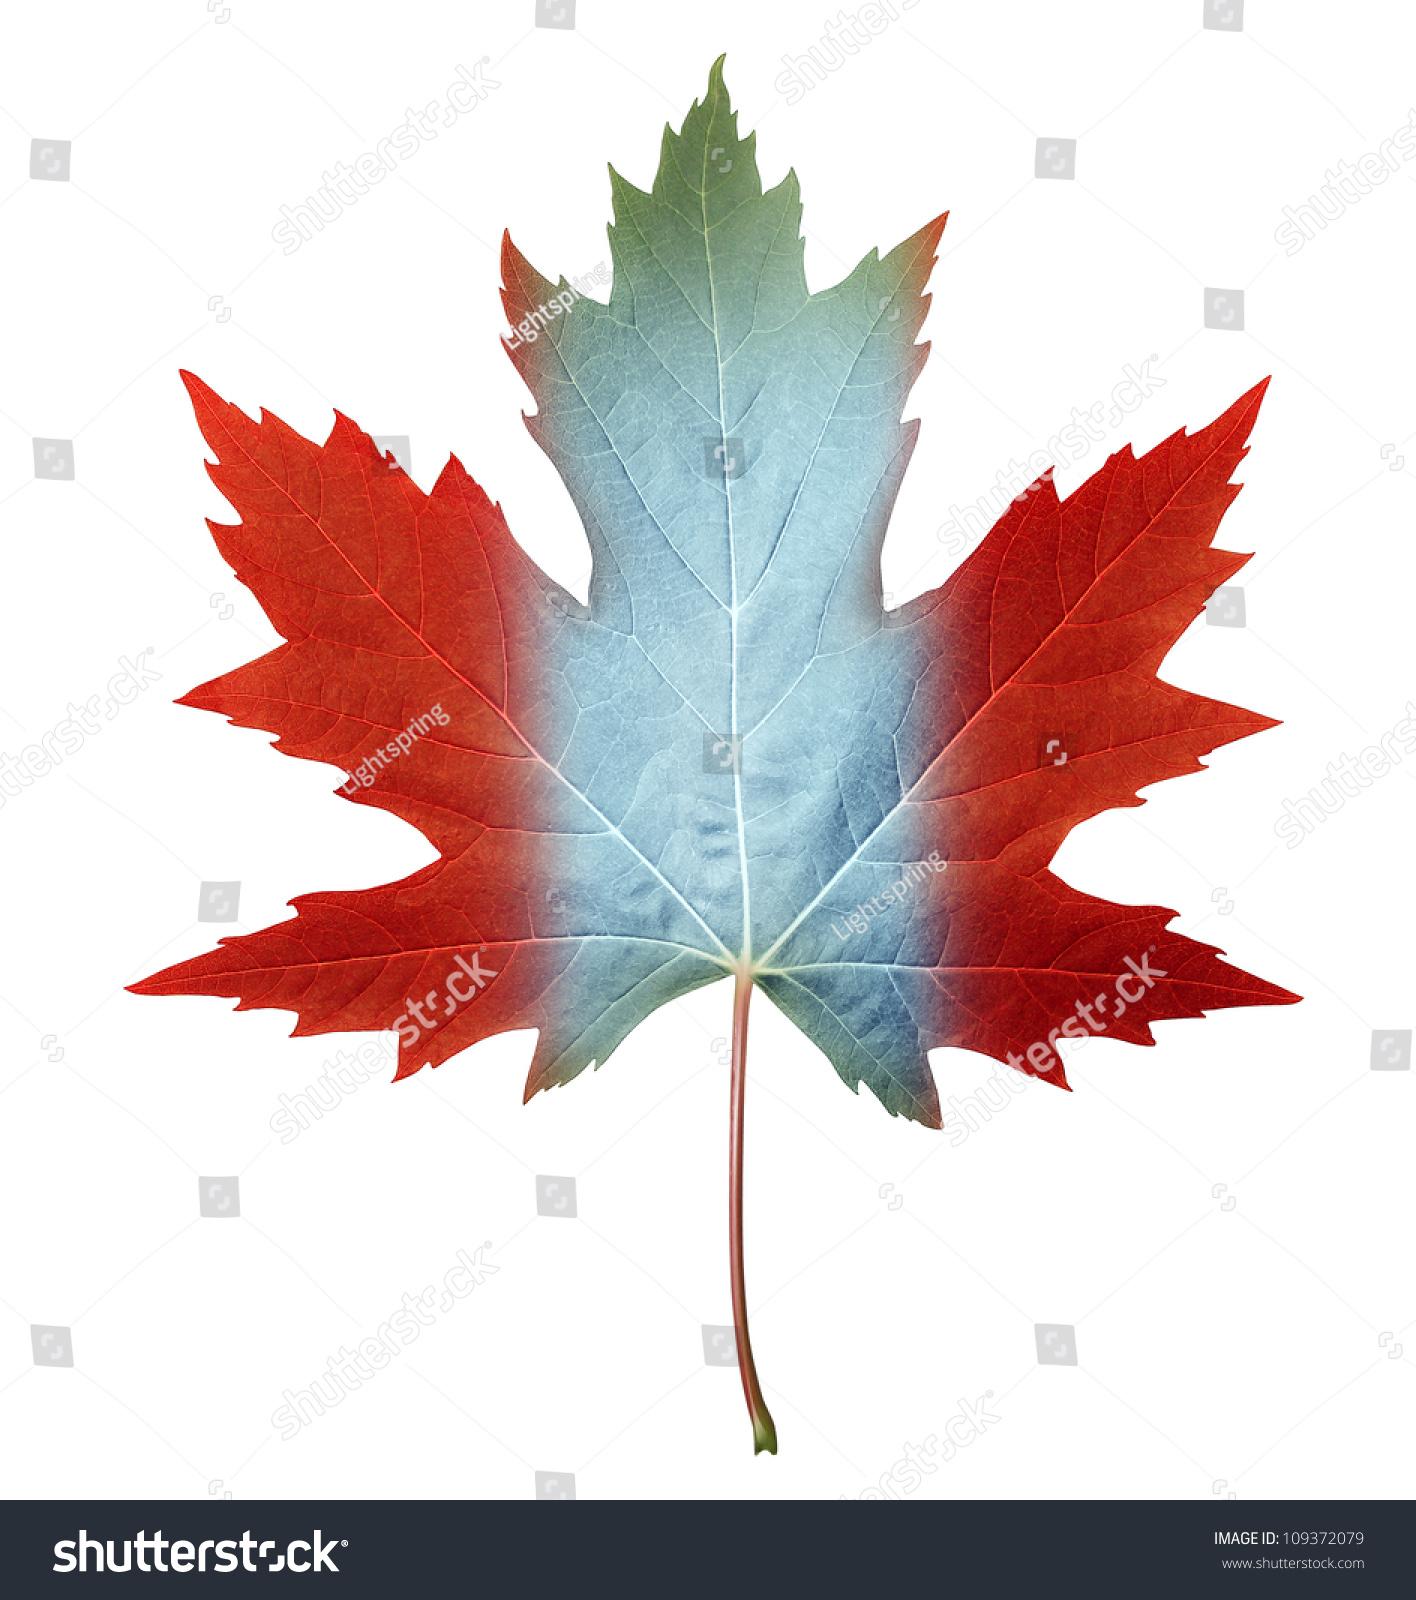 canada maple leaf canadian flag colors stock illustration